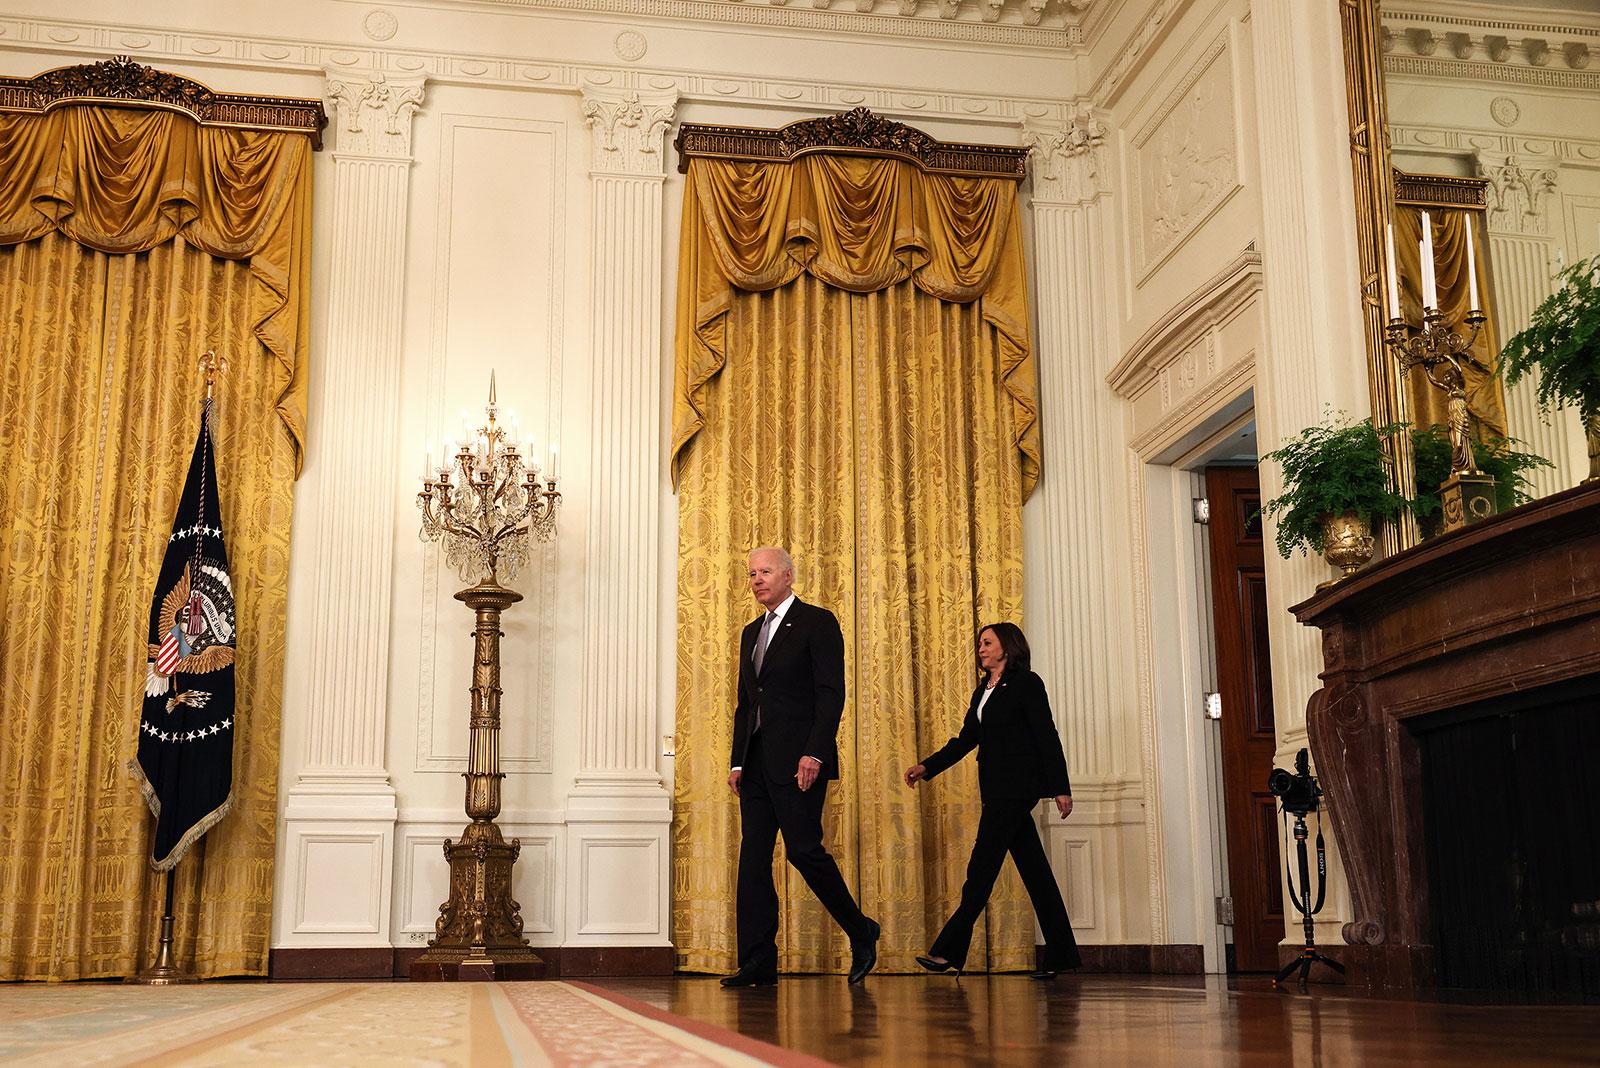 President Joe Biden and Vice President Kamala Harris arrive in the East Room of the White House on May 17.